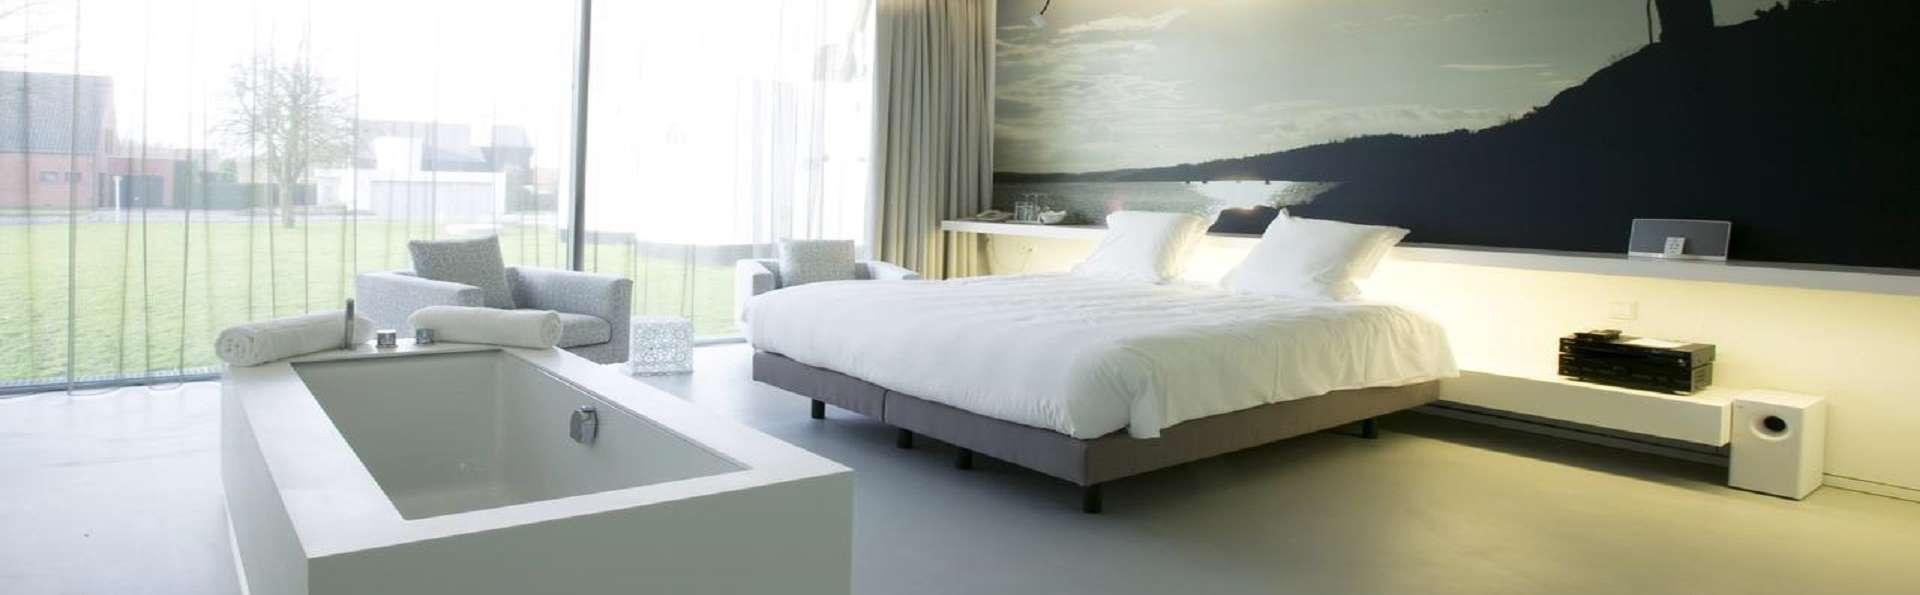 d-hotel Kortrijk - d-hotel.jpg